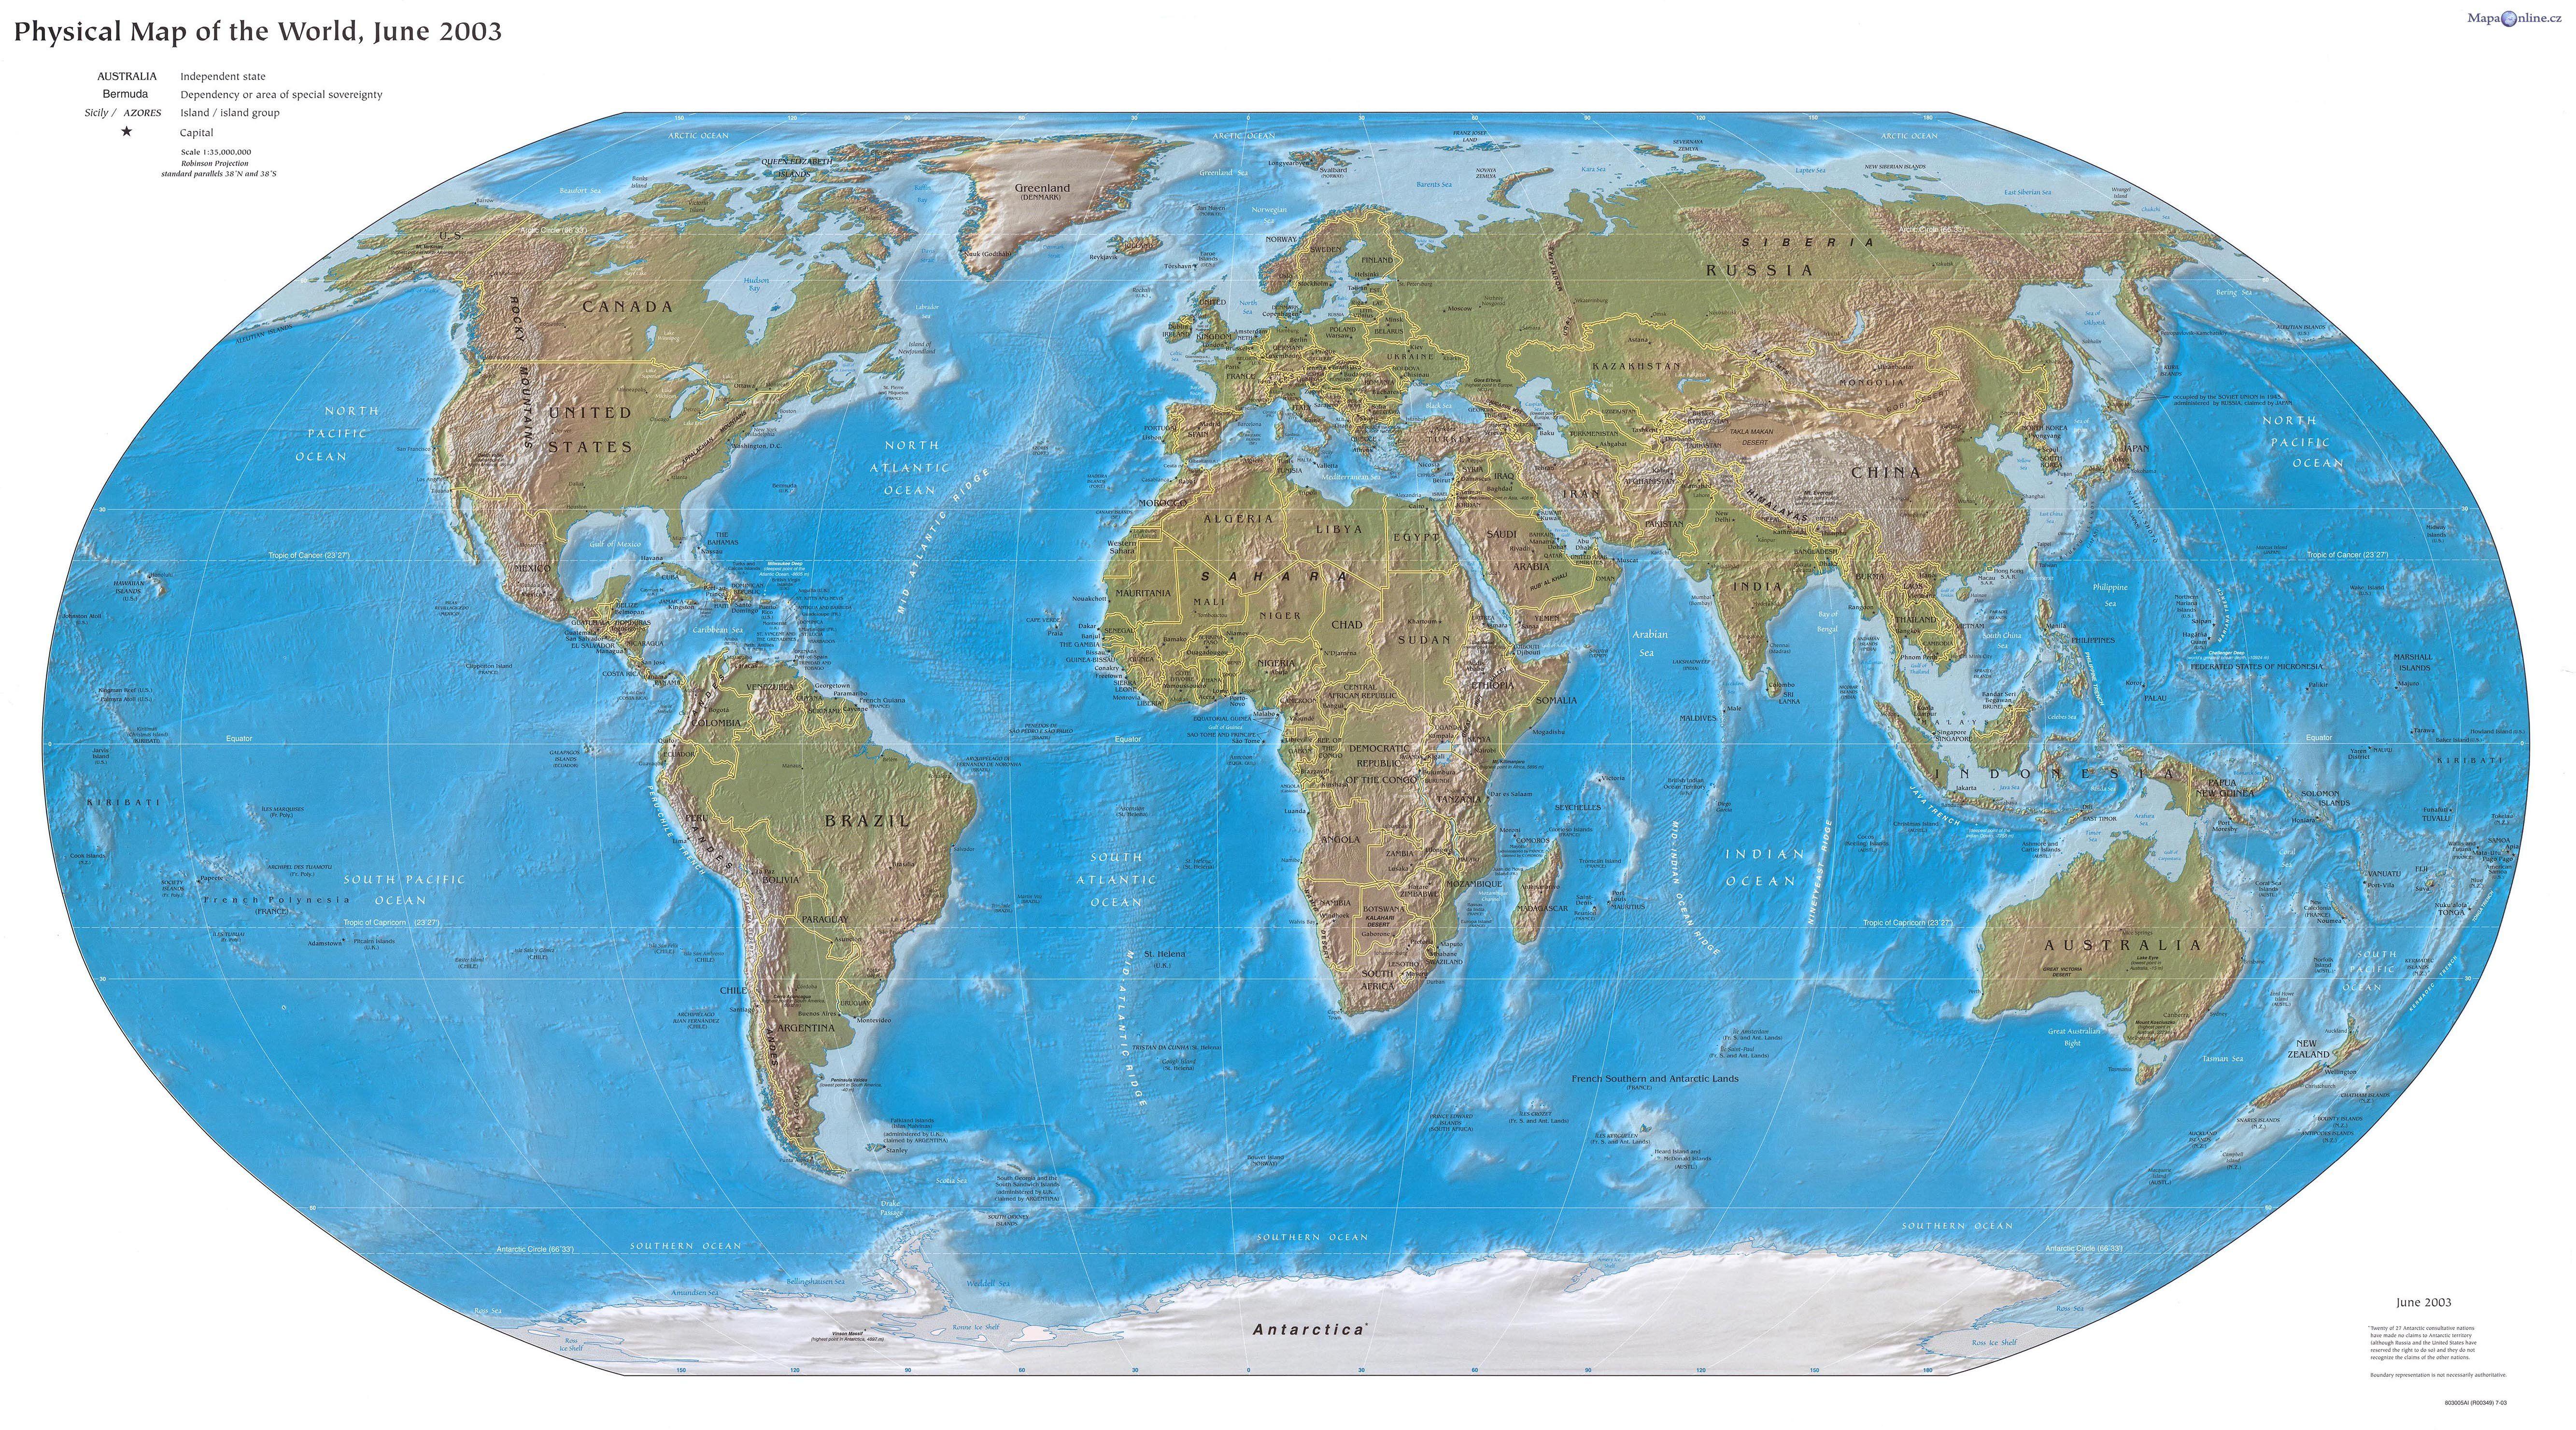 Http Mapaonline Cz Pictures 35 O Jpg Kartografie Mapy Sveta Mapa